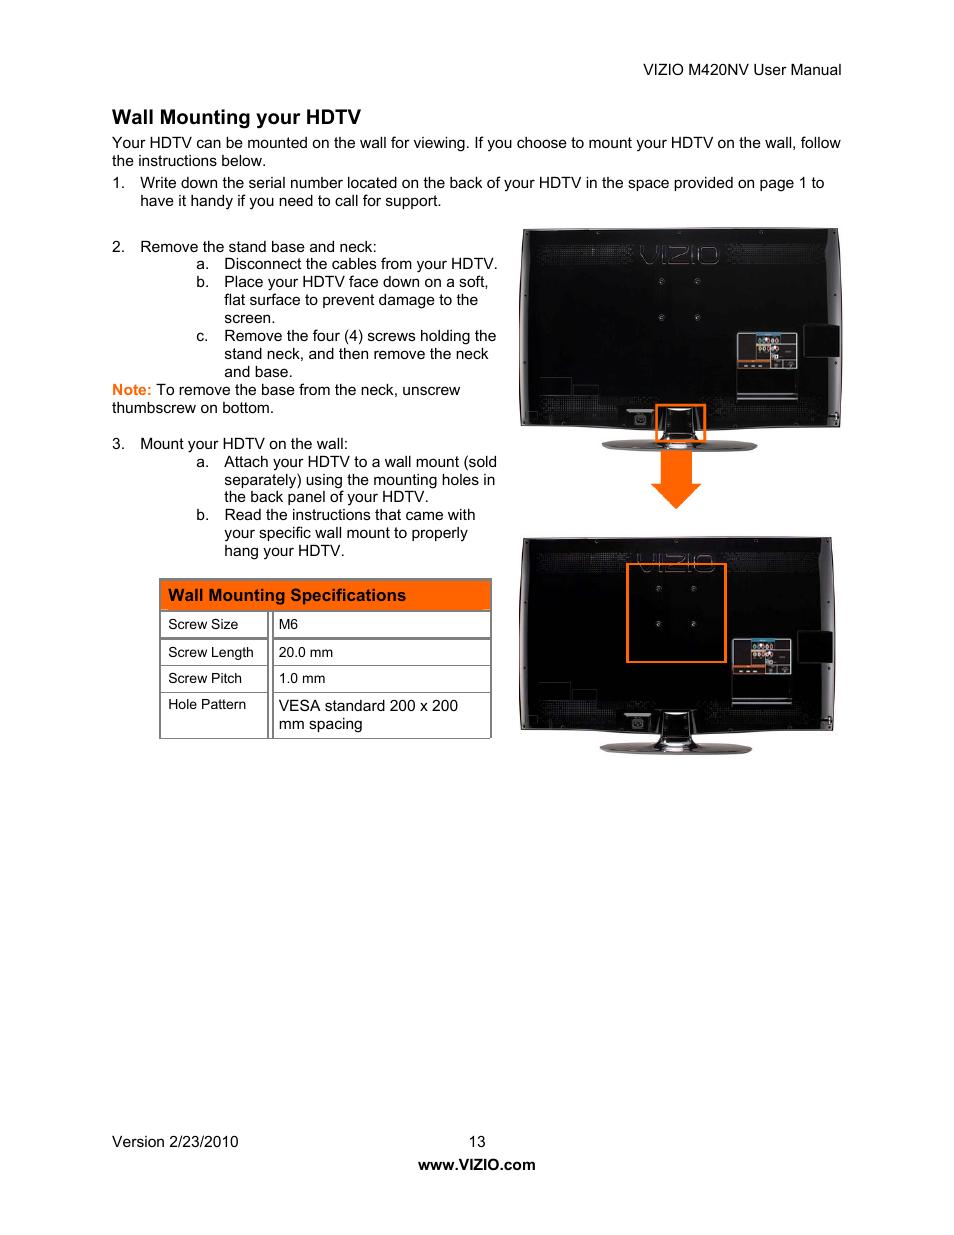 wall mounting your hdtv vizio m420nv user manual page 13 78 rh manualsdir com Vizio M420NV Power Button Vizio M420NV Problems